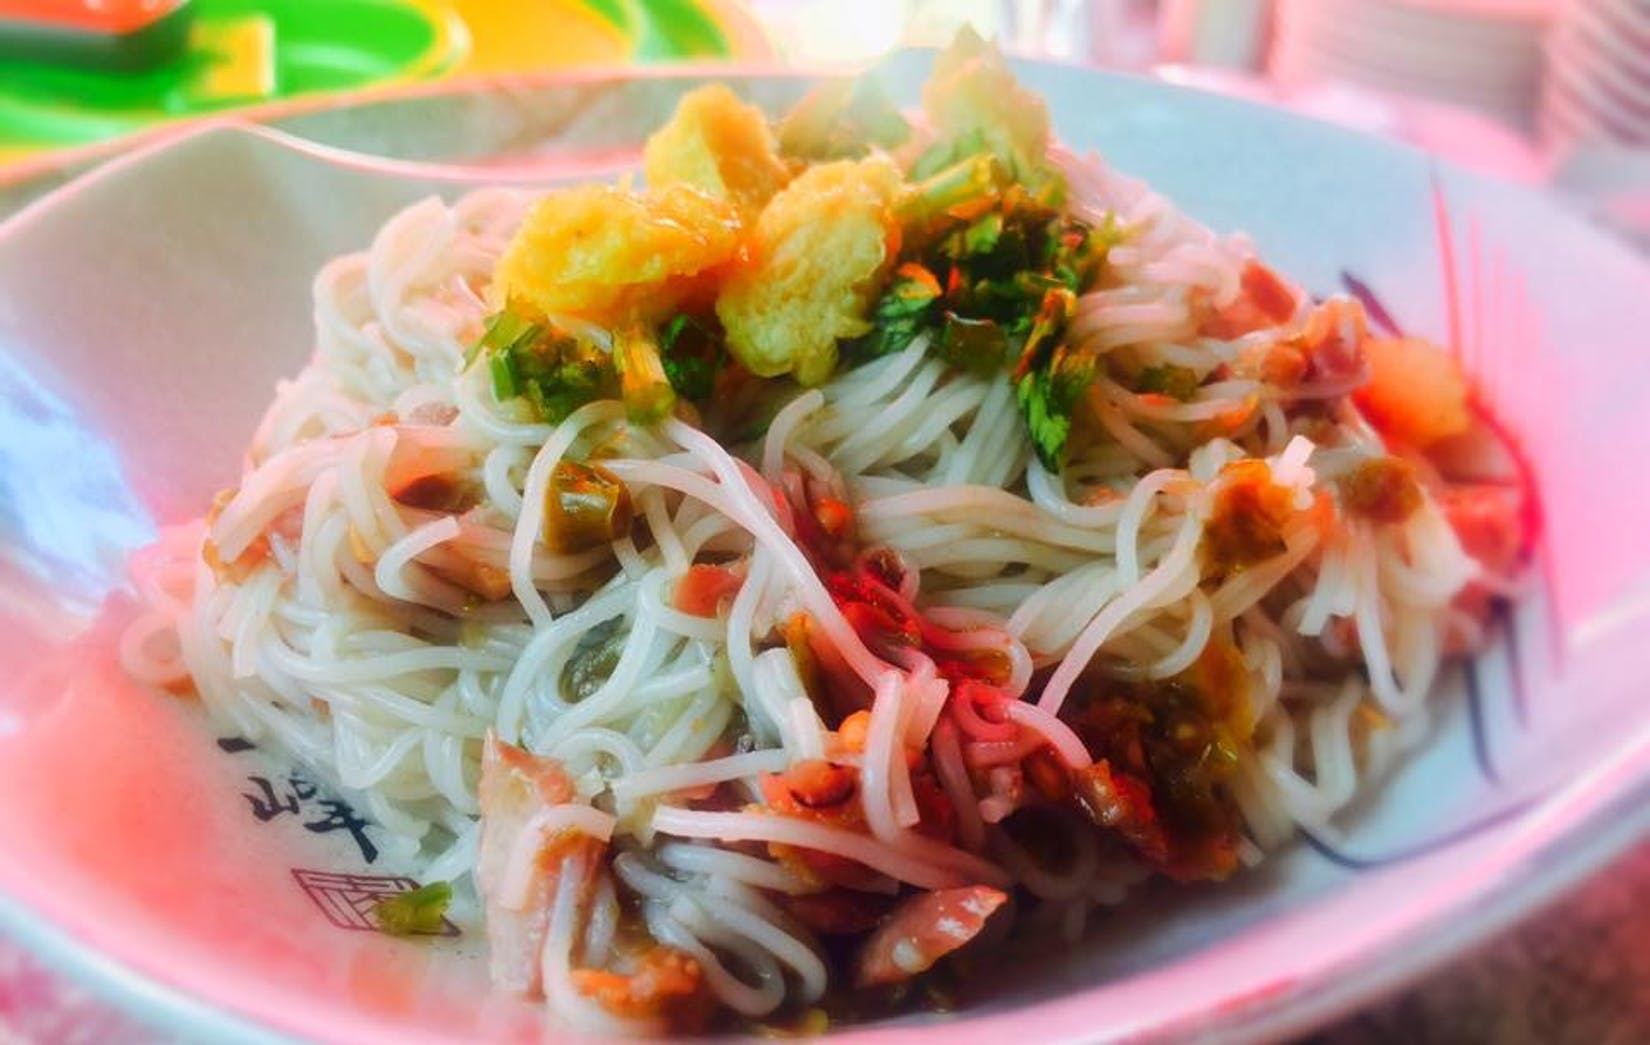 Zwe Thit Rakhine Traditional Sea Food | yathar